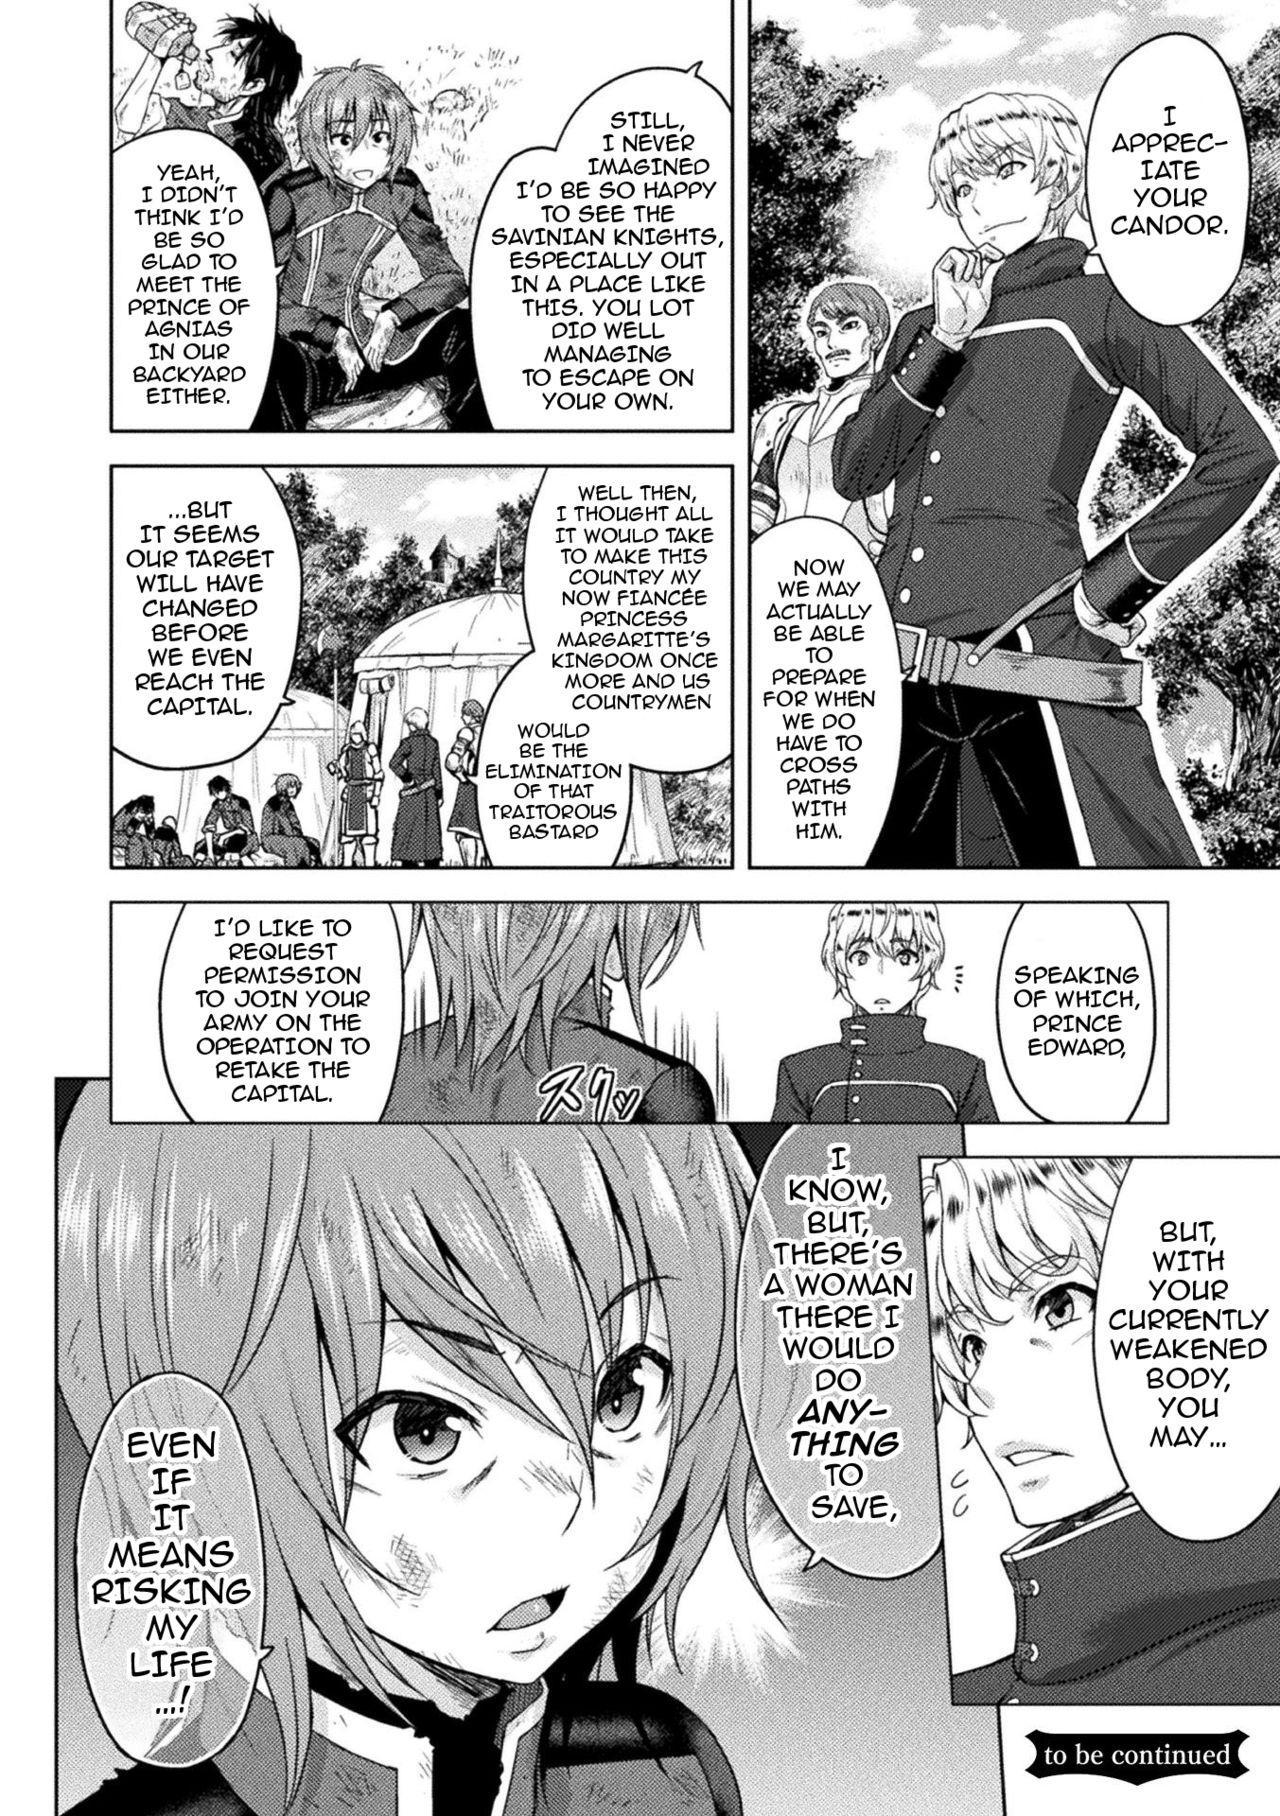 [Yamada Gogogo] Erona ~Orc no Inmon ni Okasareta Onna Kishi no Matsuro~ | Erona ~The Fall of a Beautiful Knight Cursed with the Lewd Mark of an Orc~ Ch. 1-5 [English] {darknight} 100